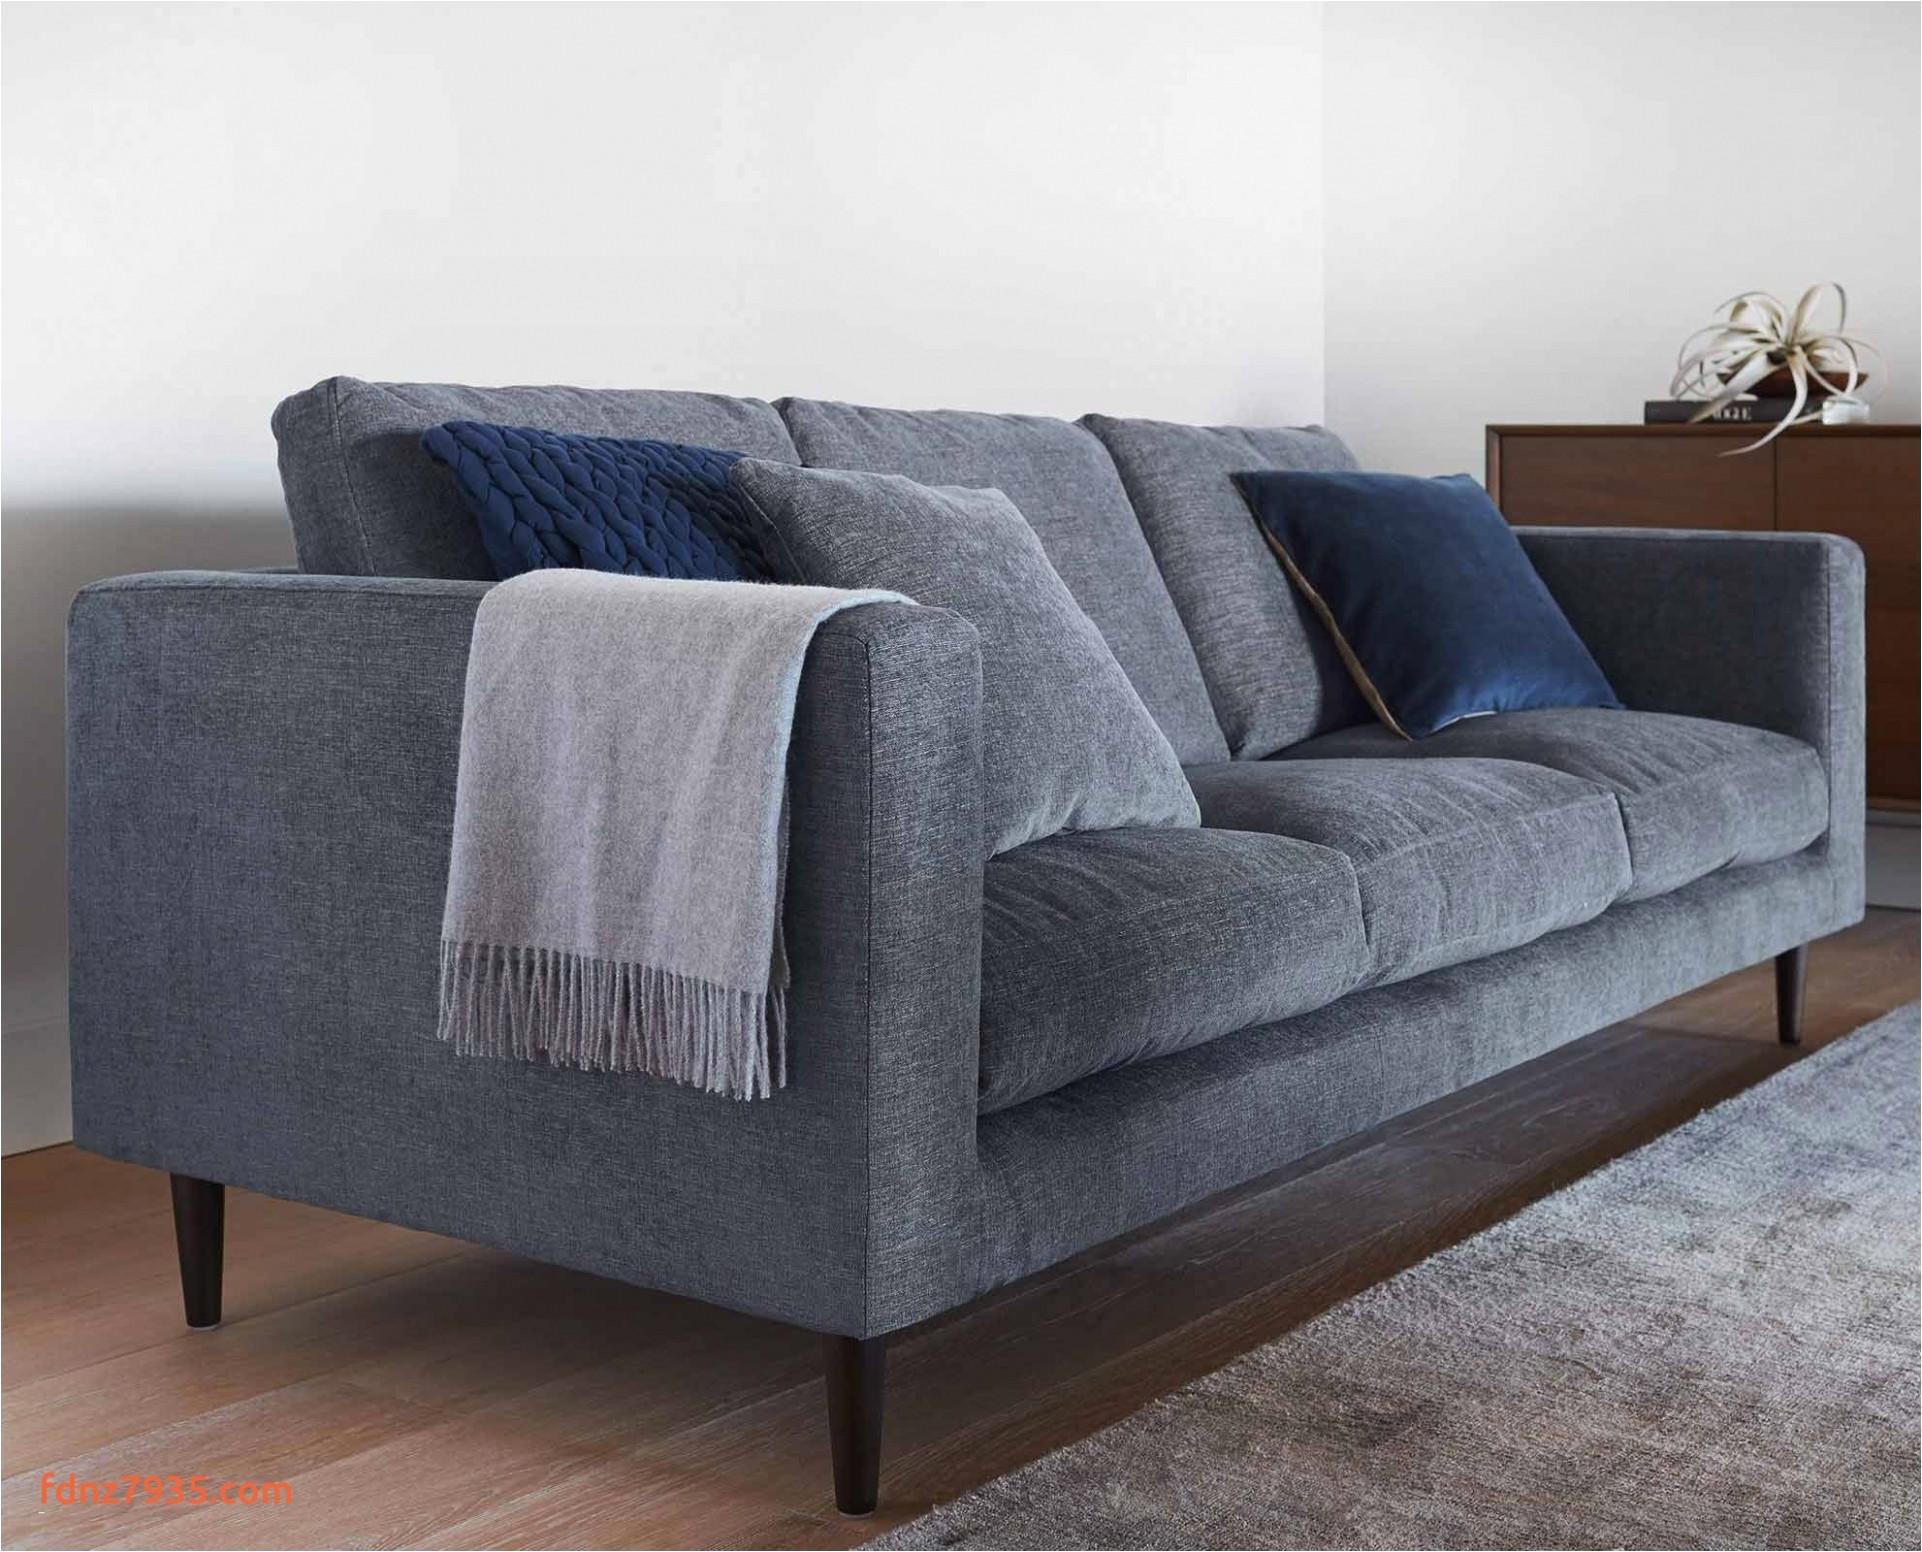 full size of futon exquisit wayfair futon couch furniture furniture www wayfair furniture 0d a